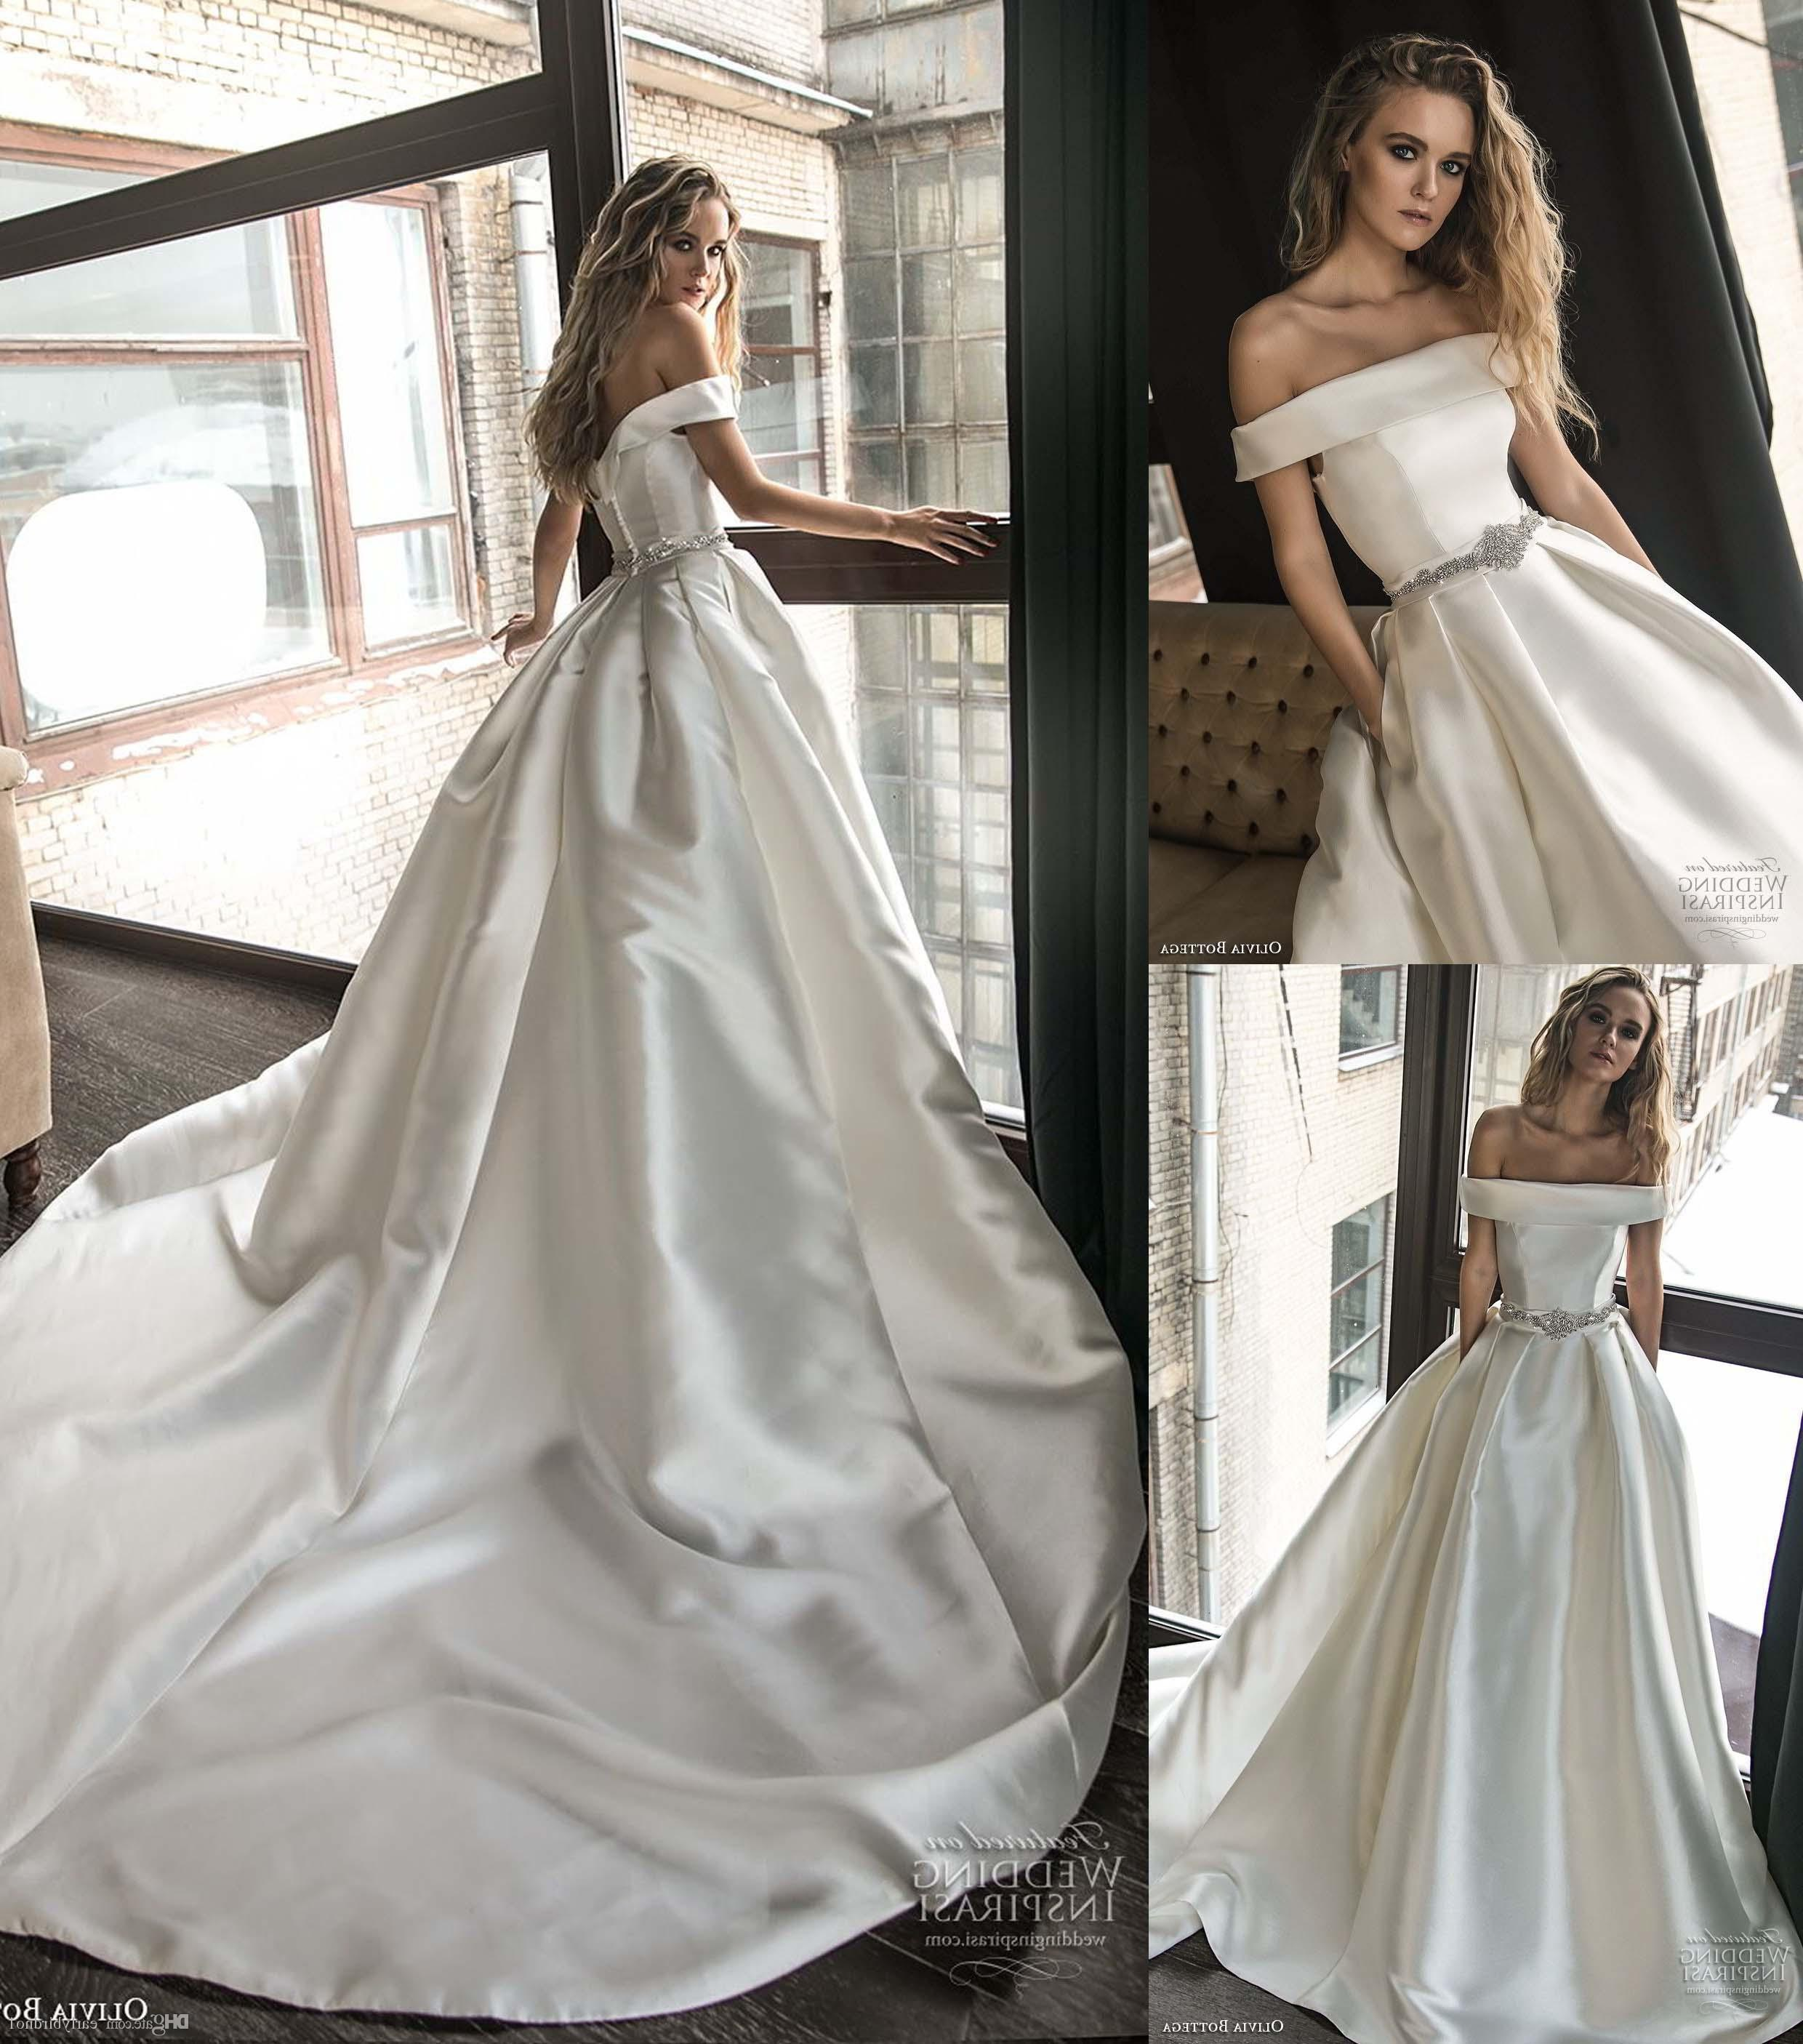 Bentuk Bridesmaid Dress Hijab Budm Wedding Ideas A Line Lace Wedding Dress Eye Popping